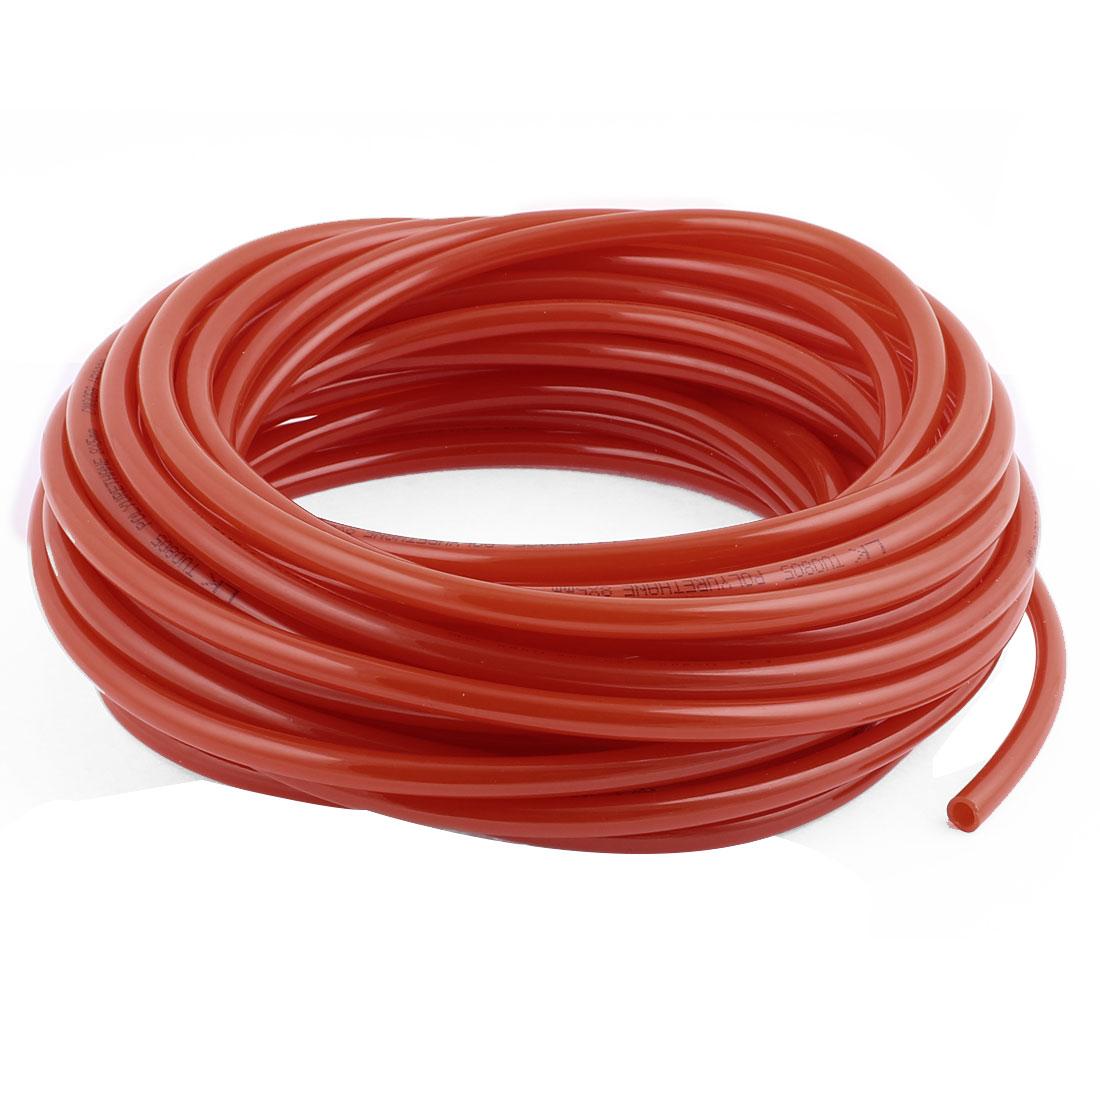 Polyurethane Flexible Air Tubing Pneumatic Hose Tube Orange 8 x 5mm x 15M